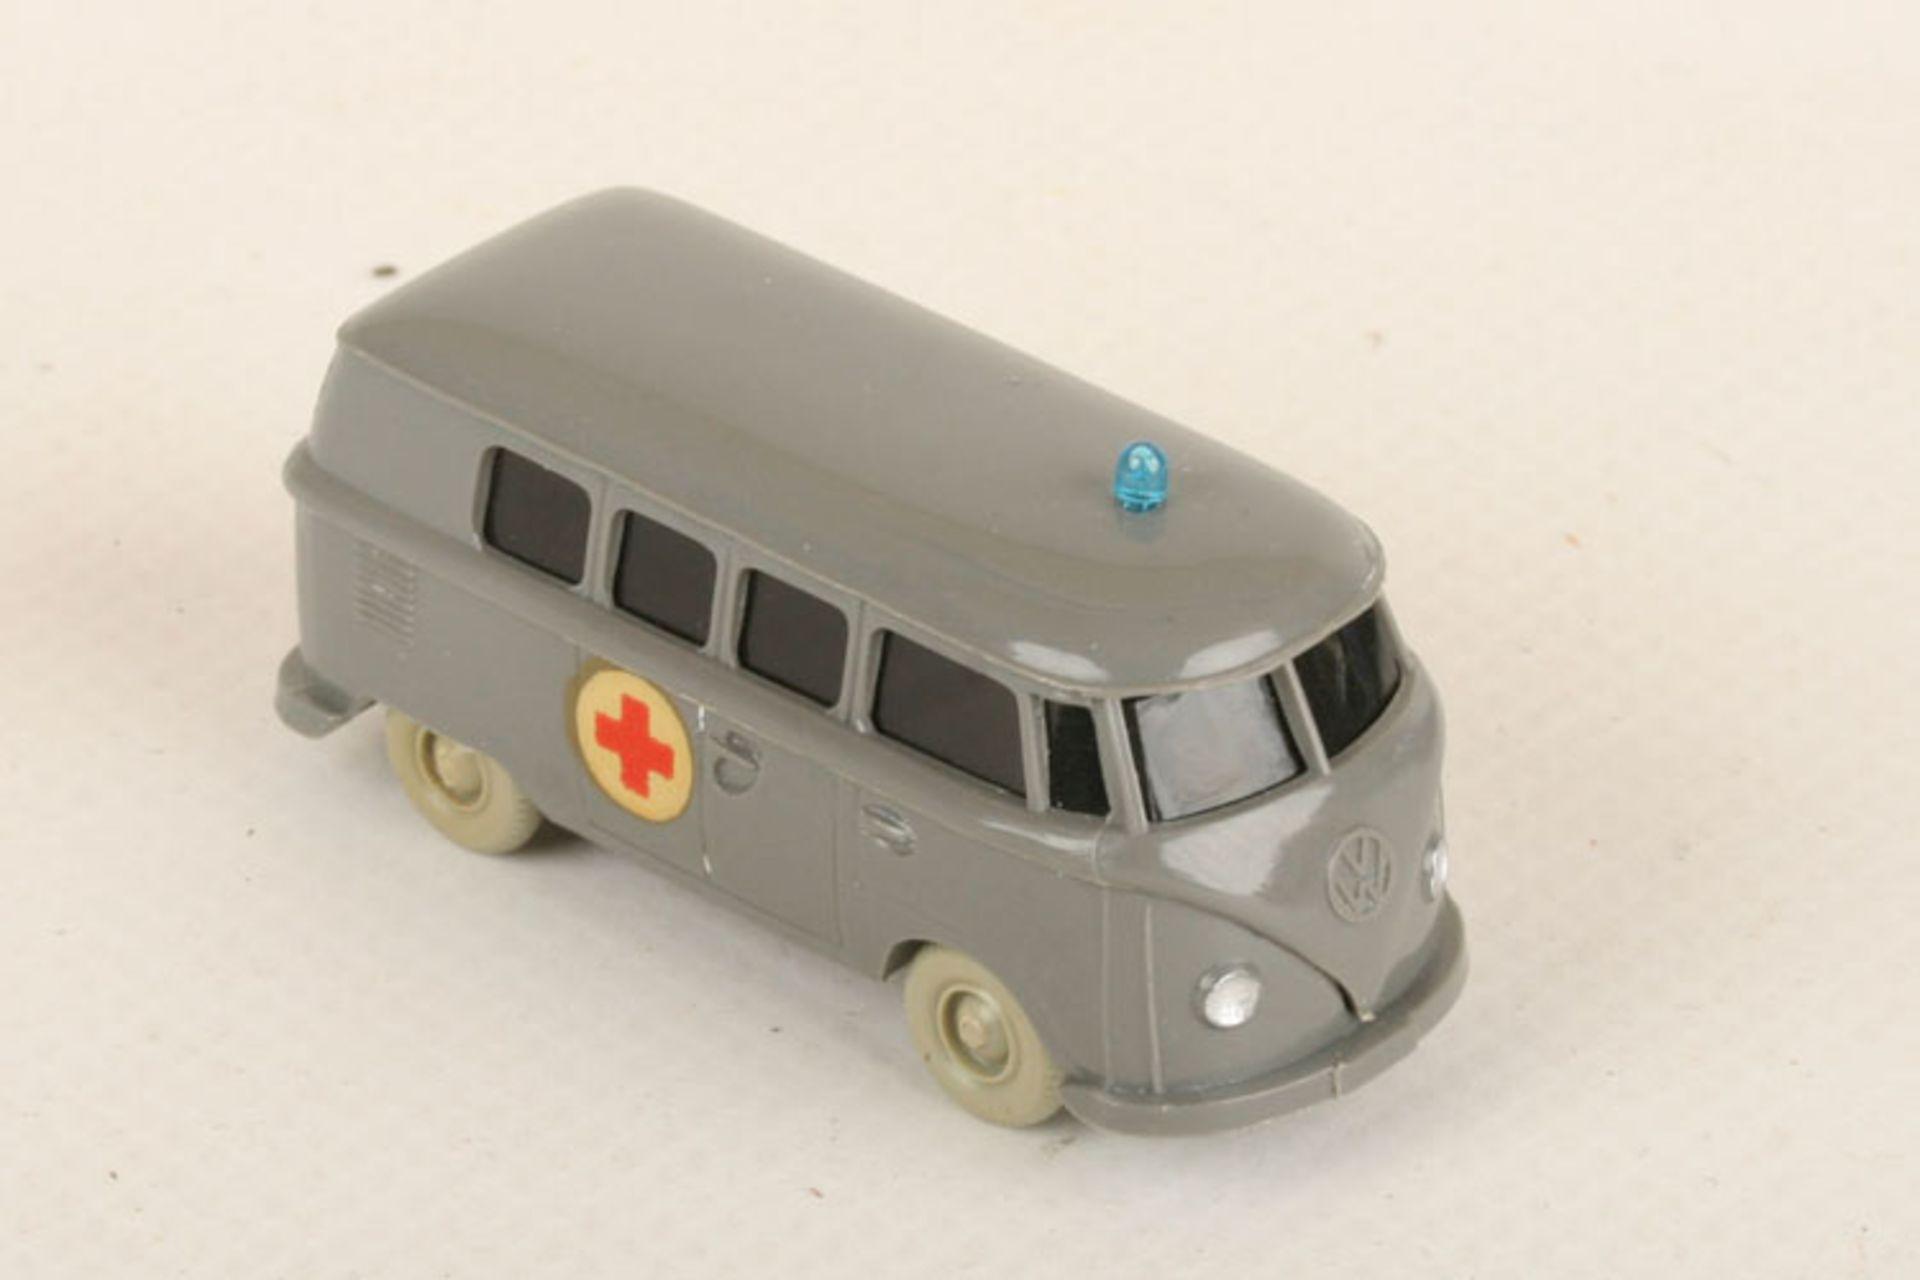 Los 1050 - Wiking VW T1 Krankenwagen staubgrau 320/10a, Abziehbild beidseitig perfekt, neuwertig